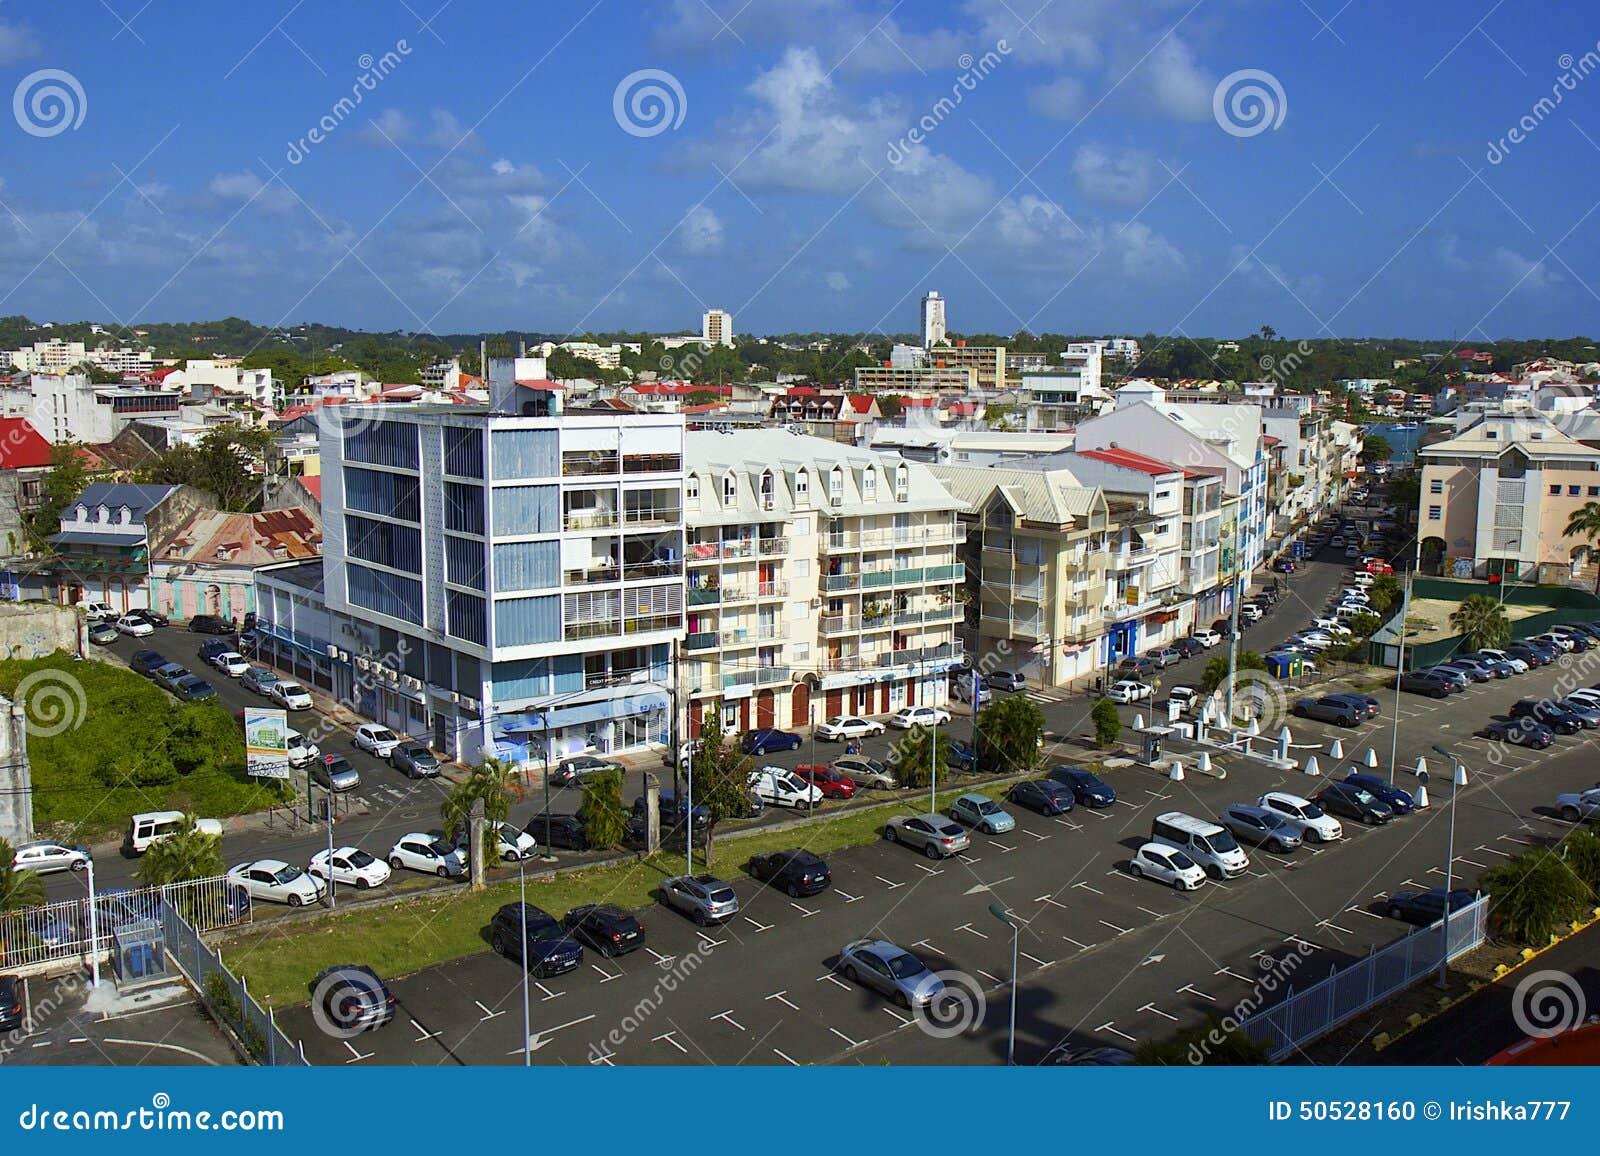 Mulheres Sozinhas Capital Guadeloupe-5467